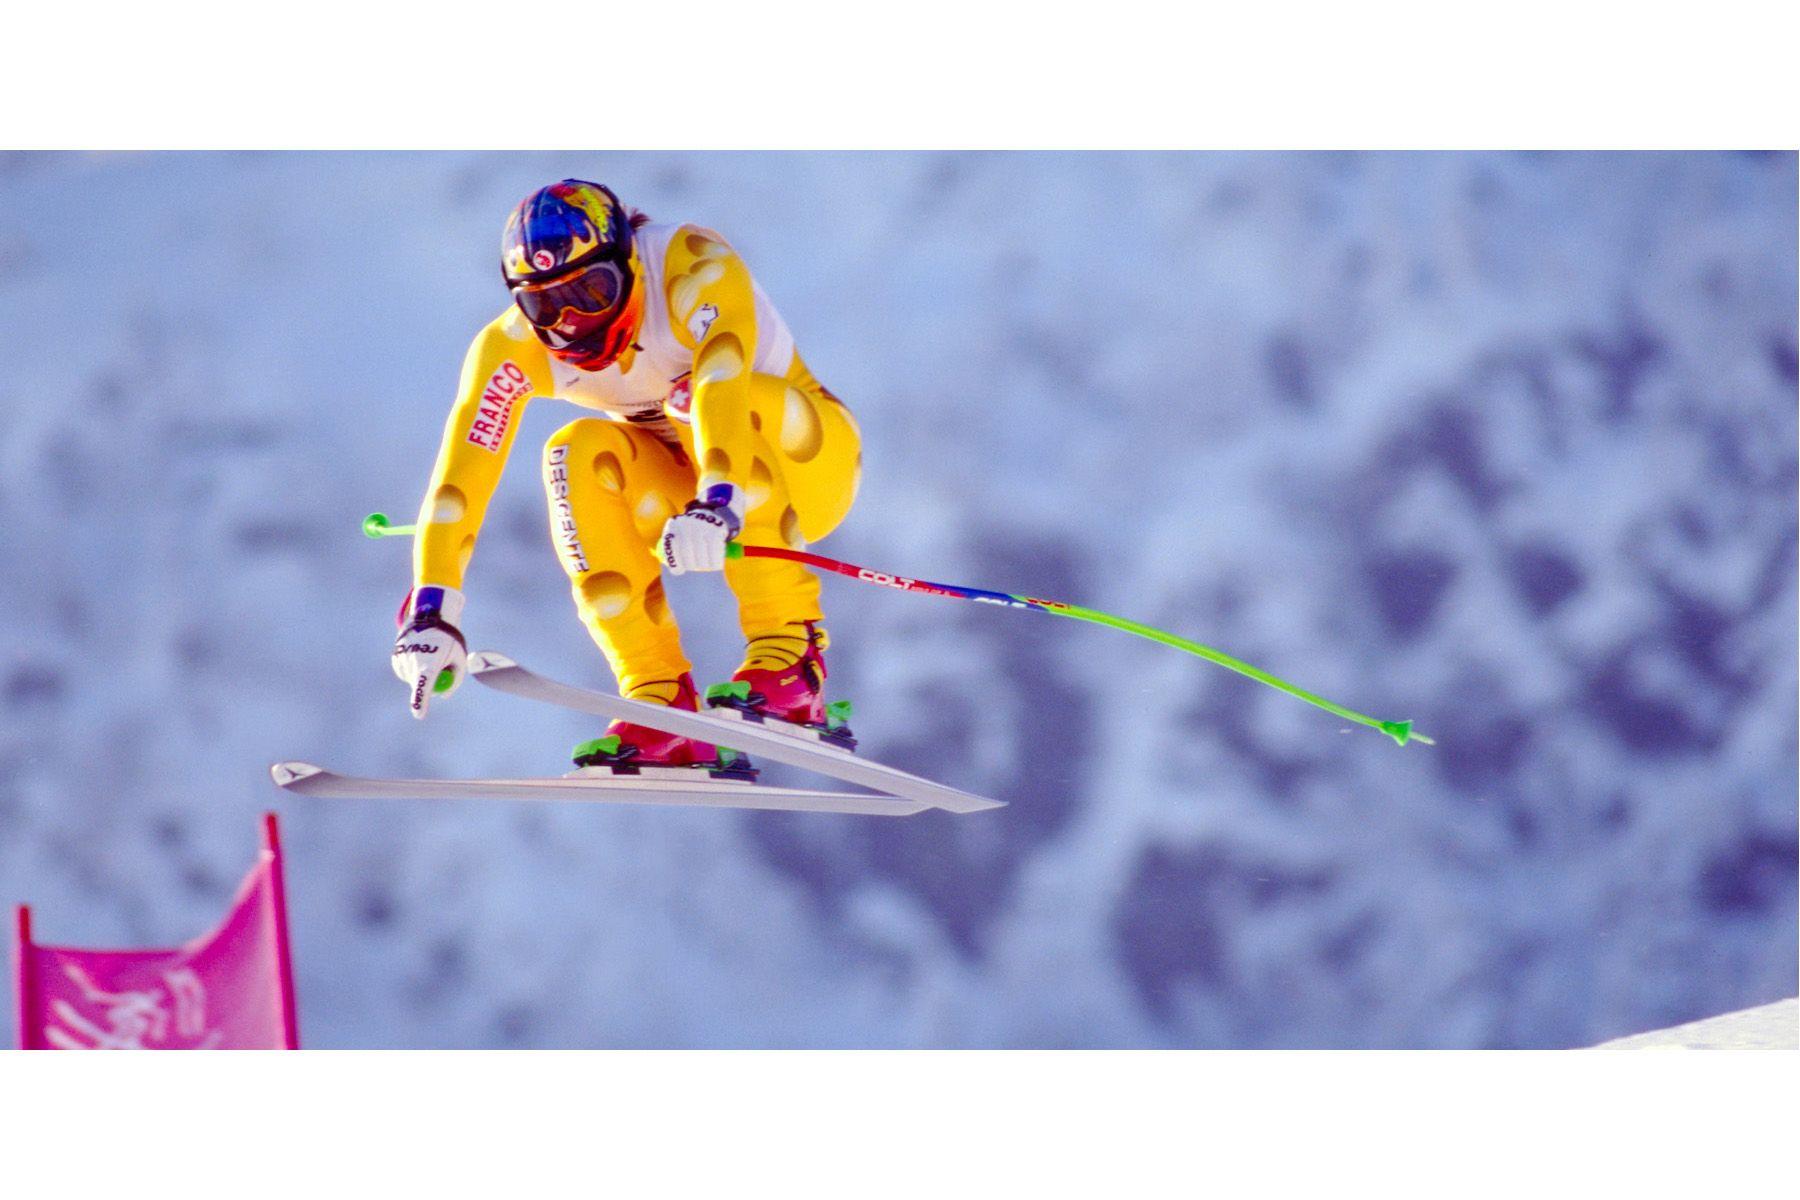 Lillehammer_Downhill_Racer.jpg